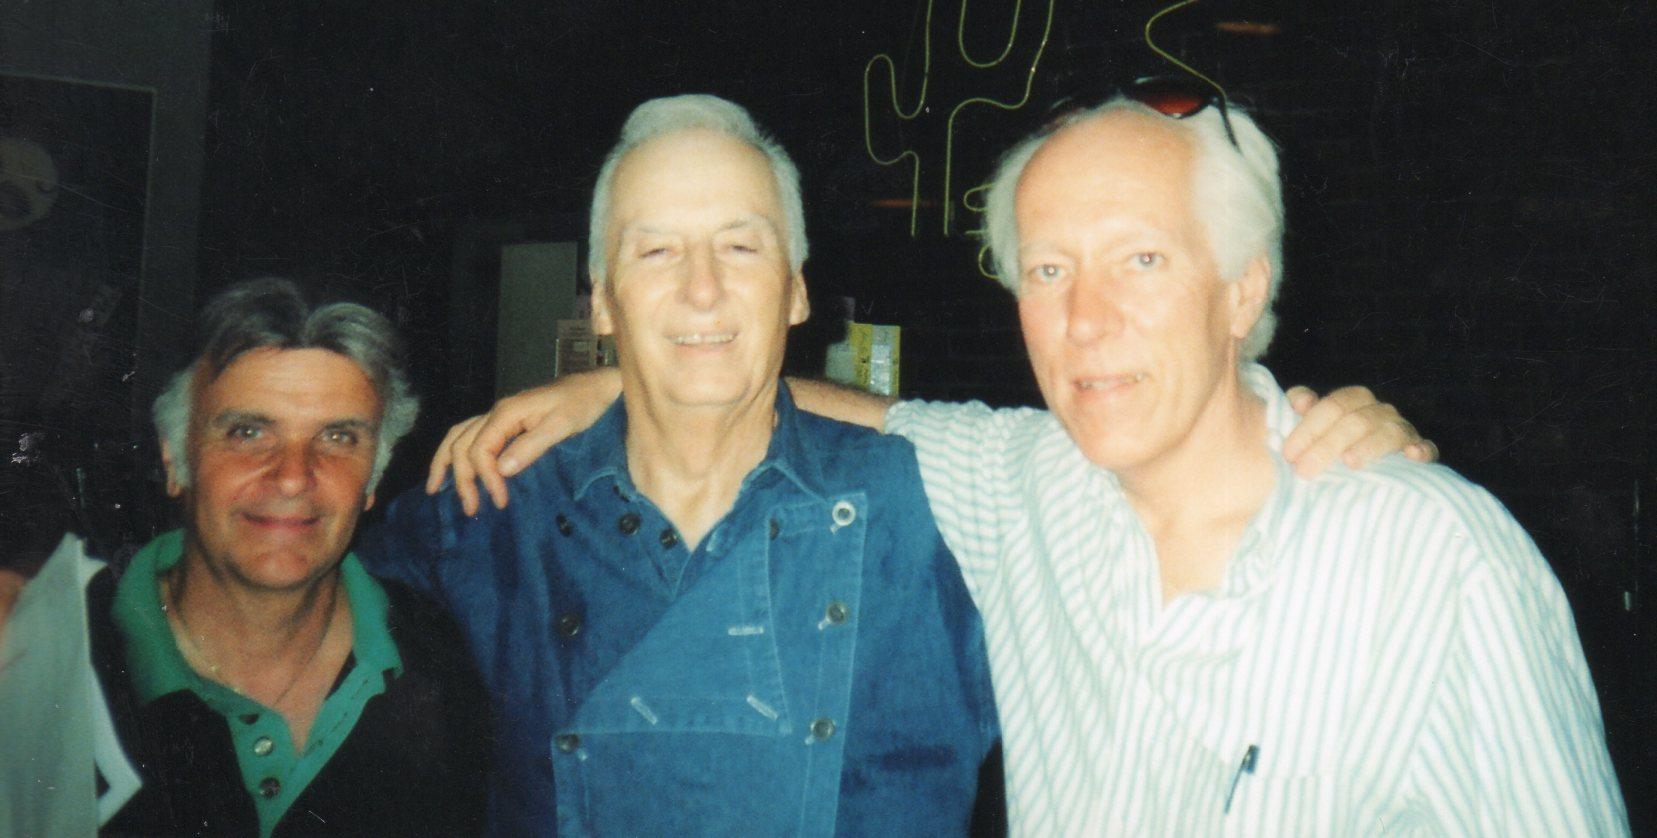 Sonny Burgess & George Carpenter